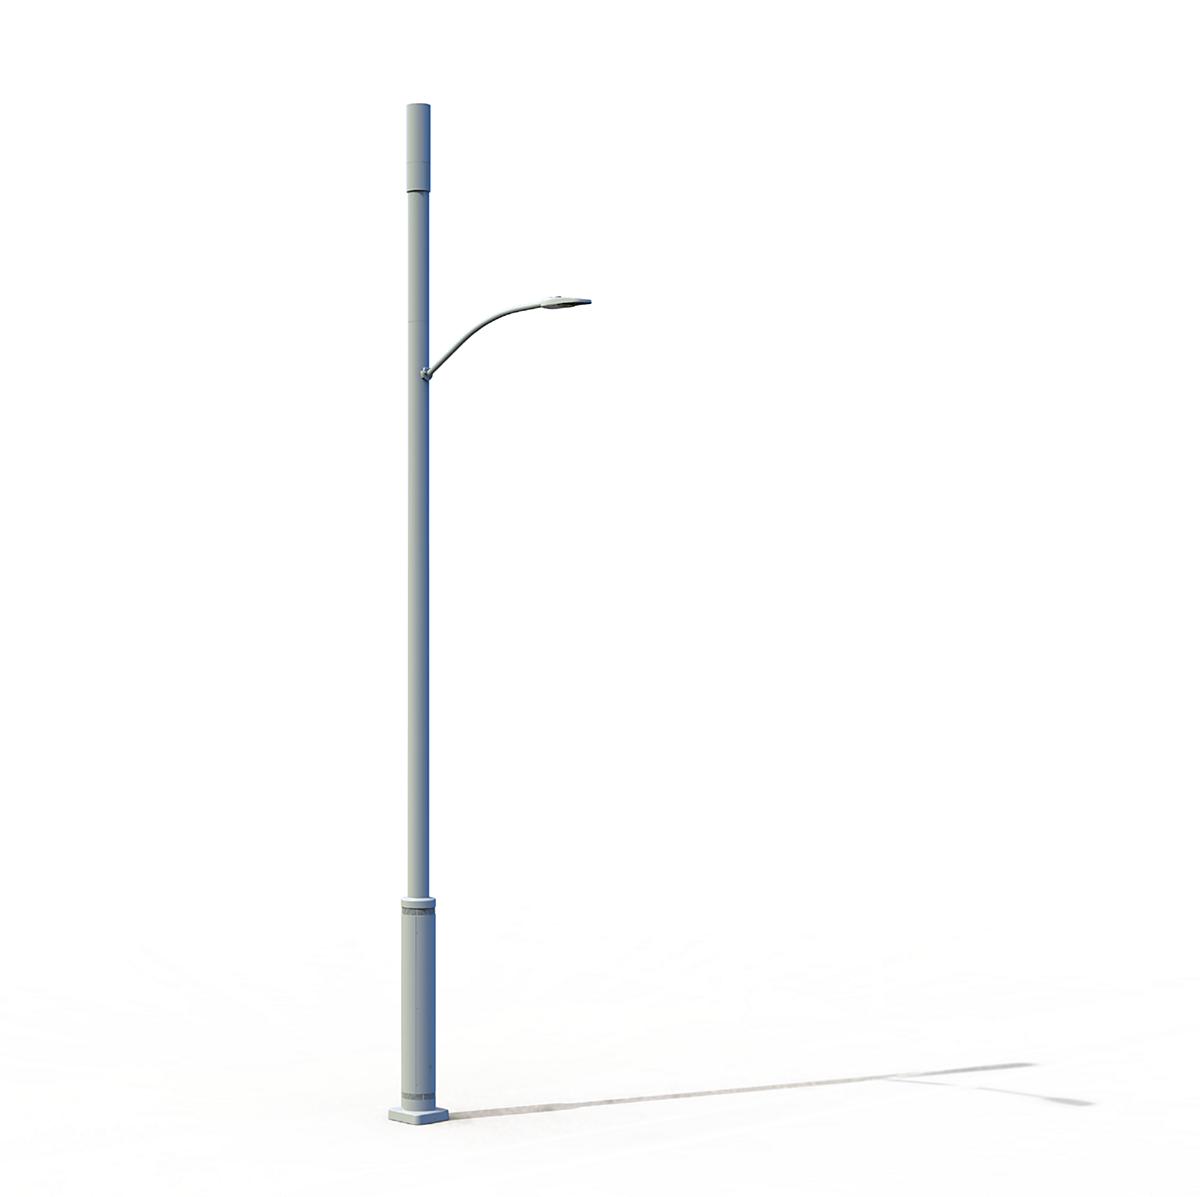 BrightSites T-Series Streamline Pole